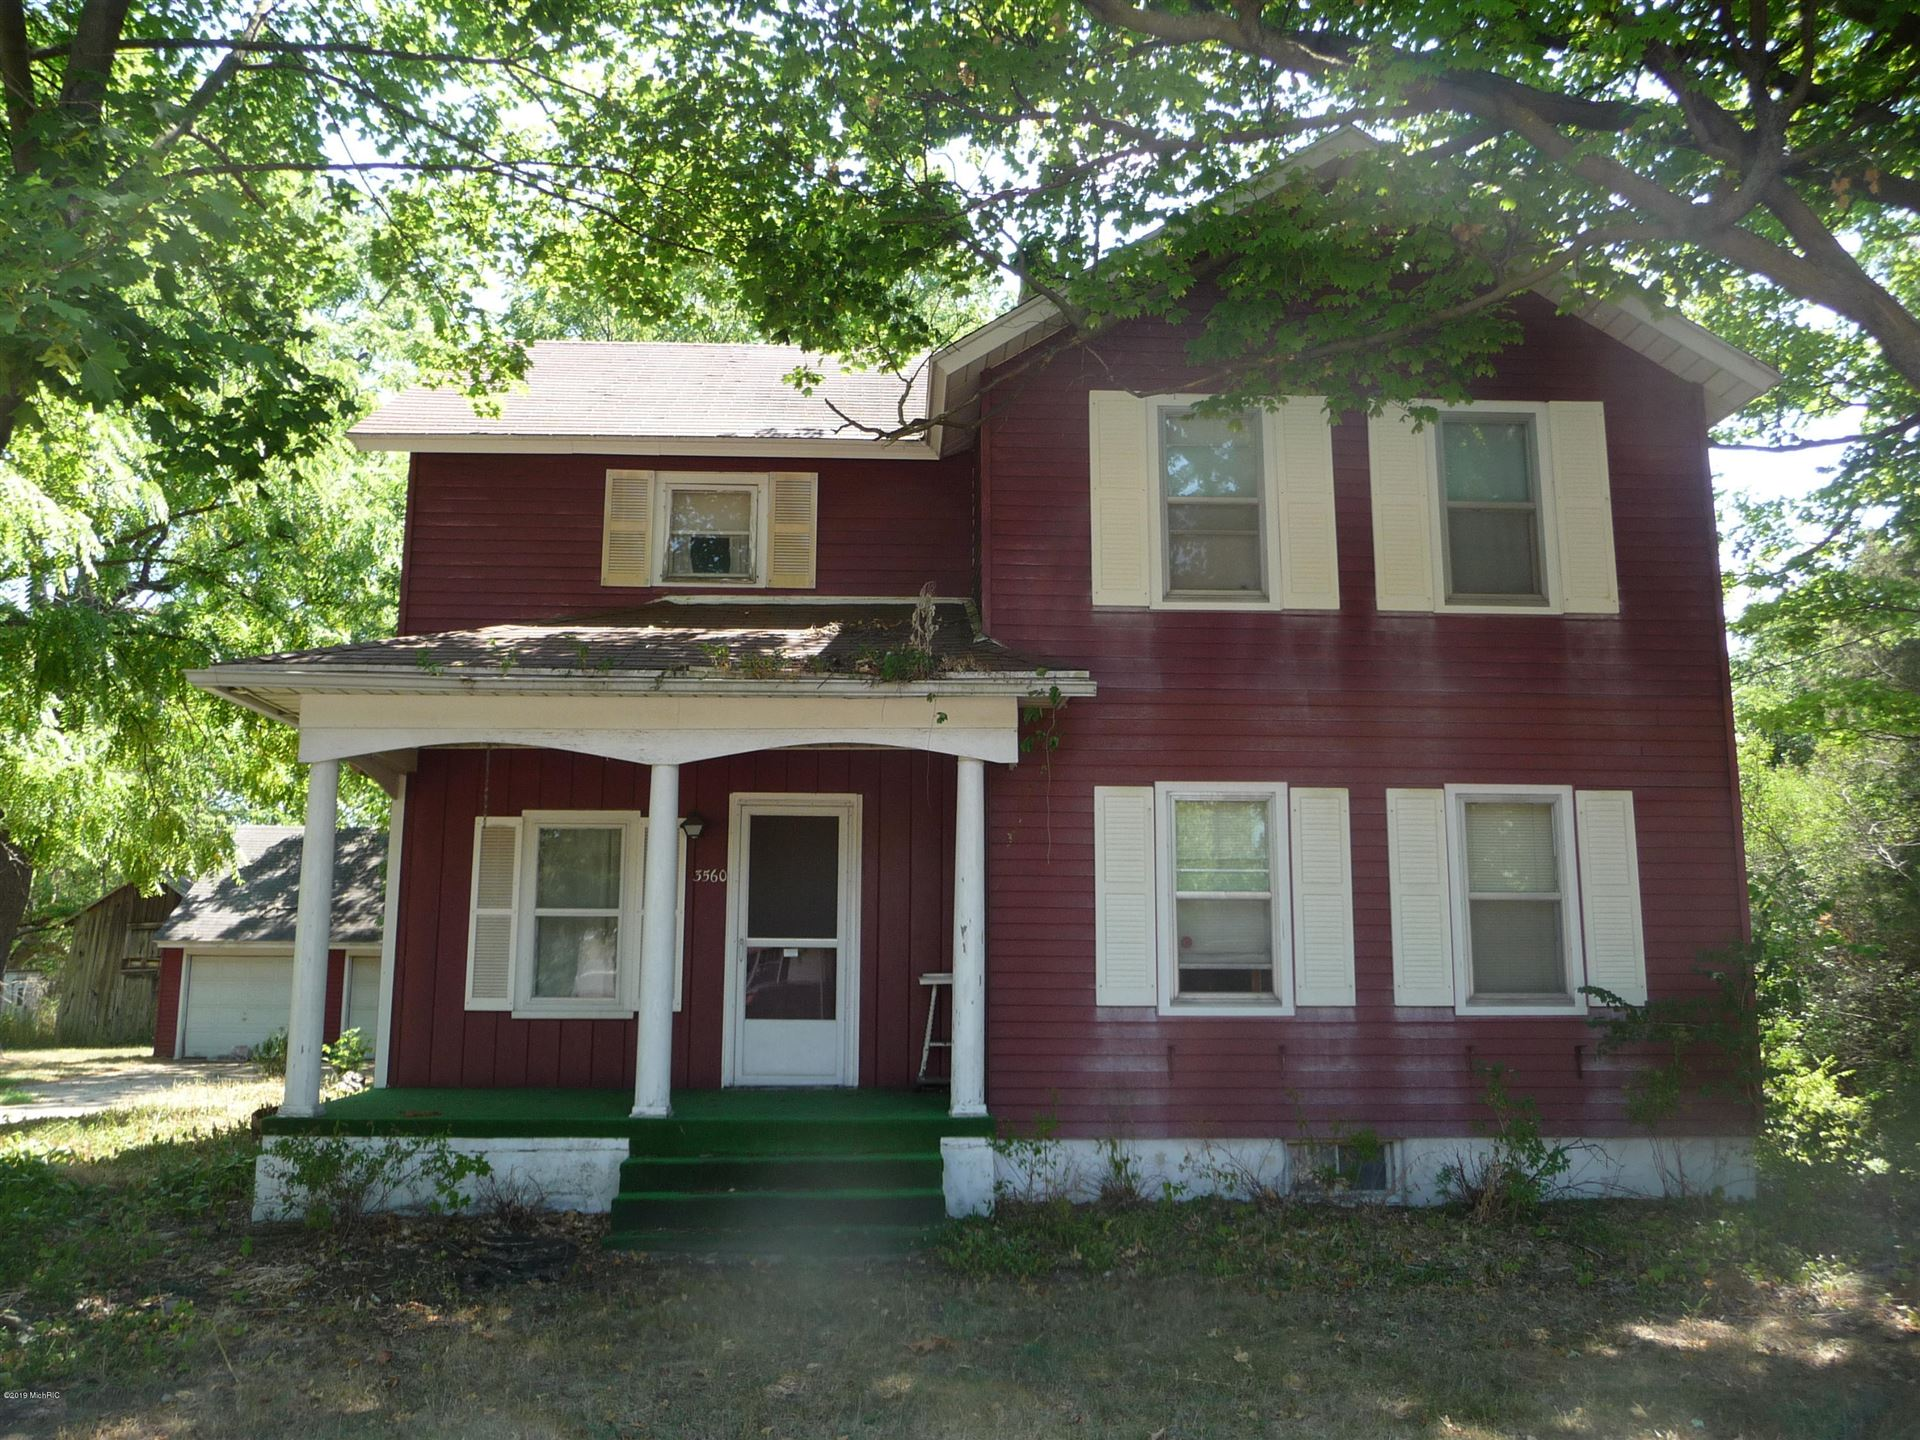 3560 Ivanrest Avenue SW #1, Grandville, MI 49418 - MLS#: 19046066